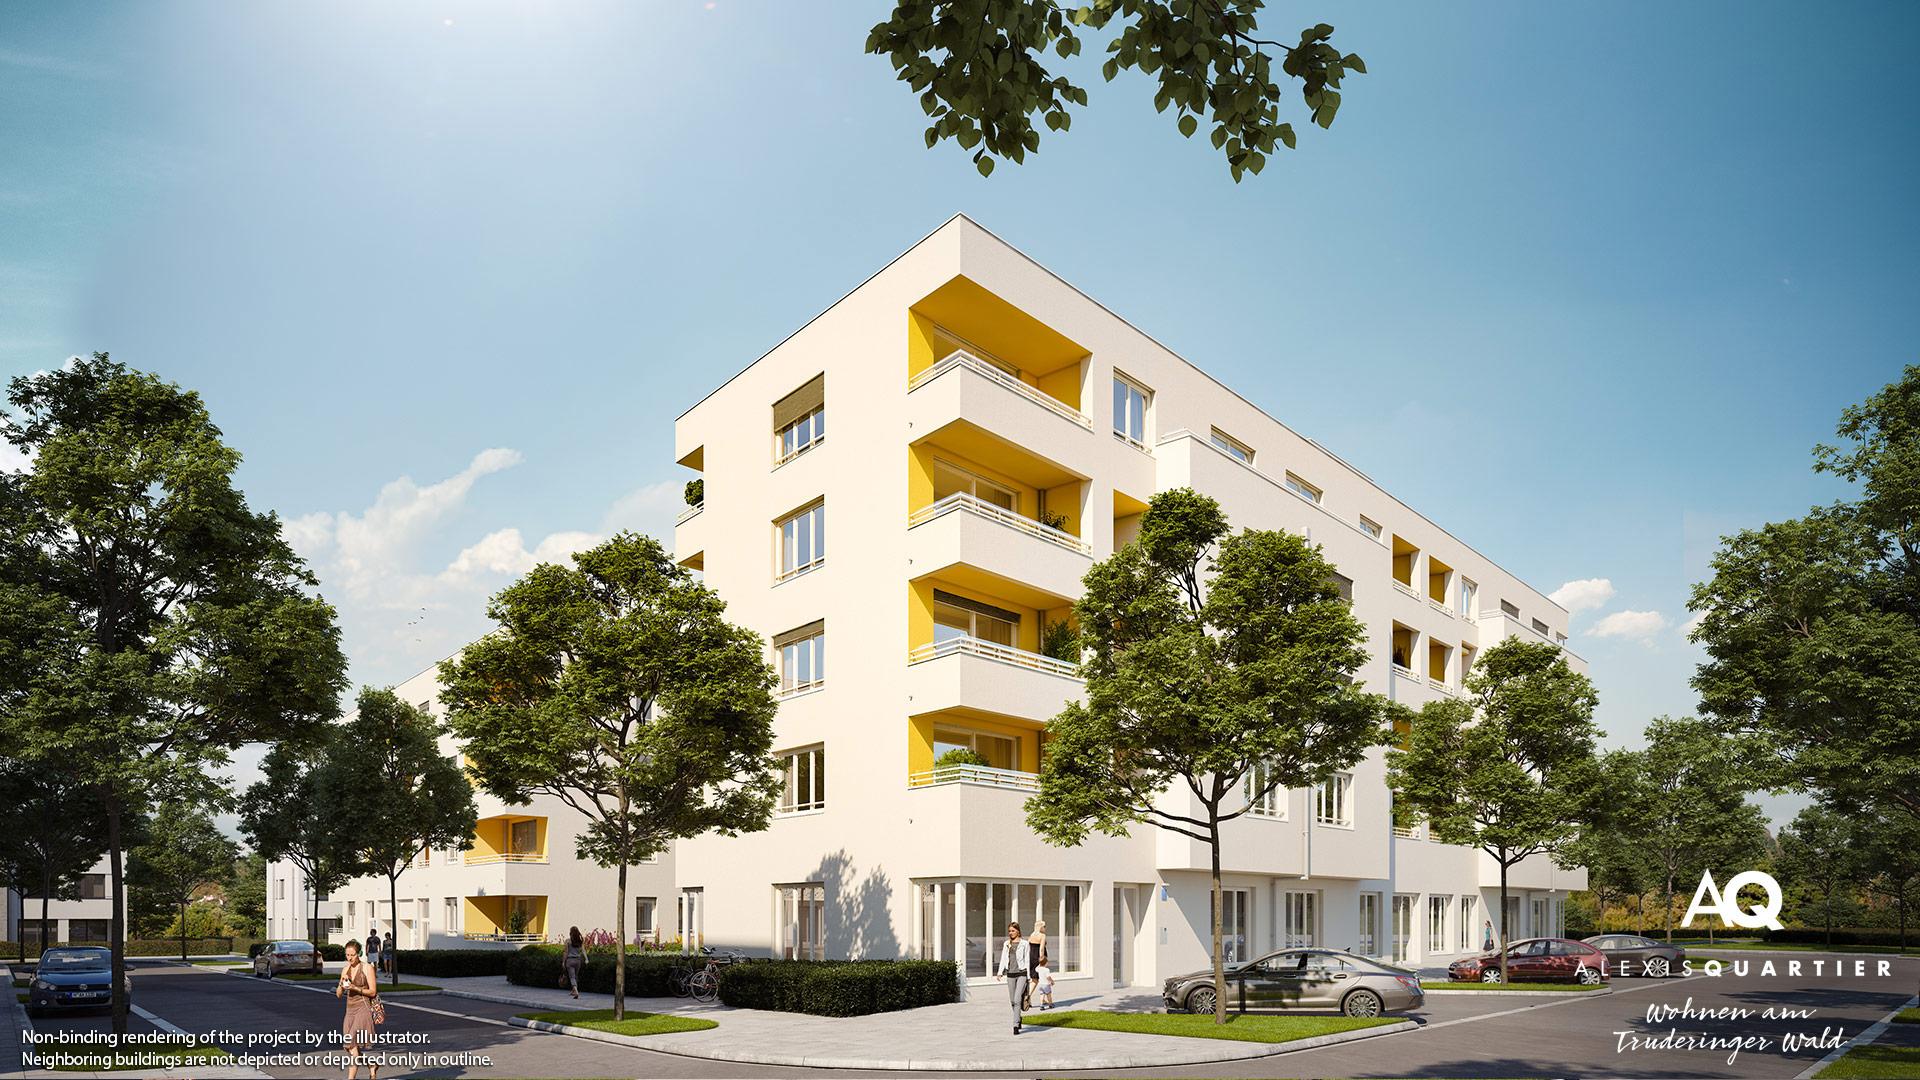 Property Alexisquartier - Wohnen am Truderinger Wald - Illustration 1